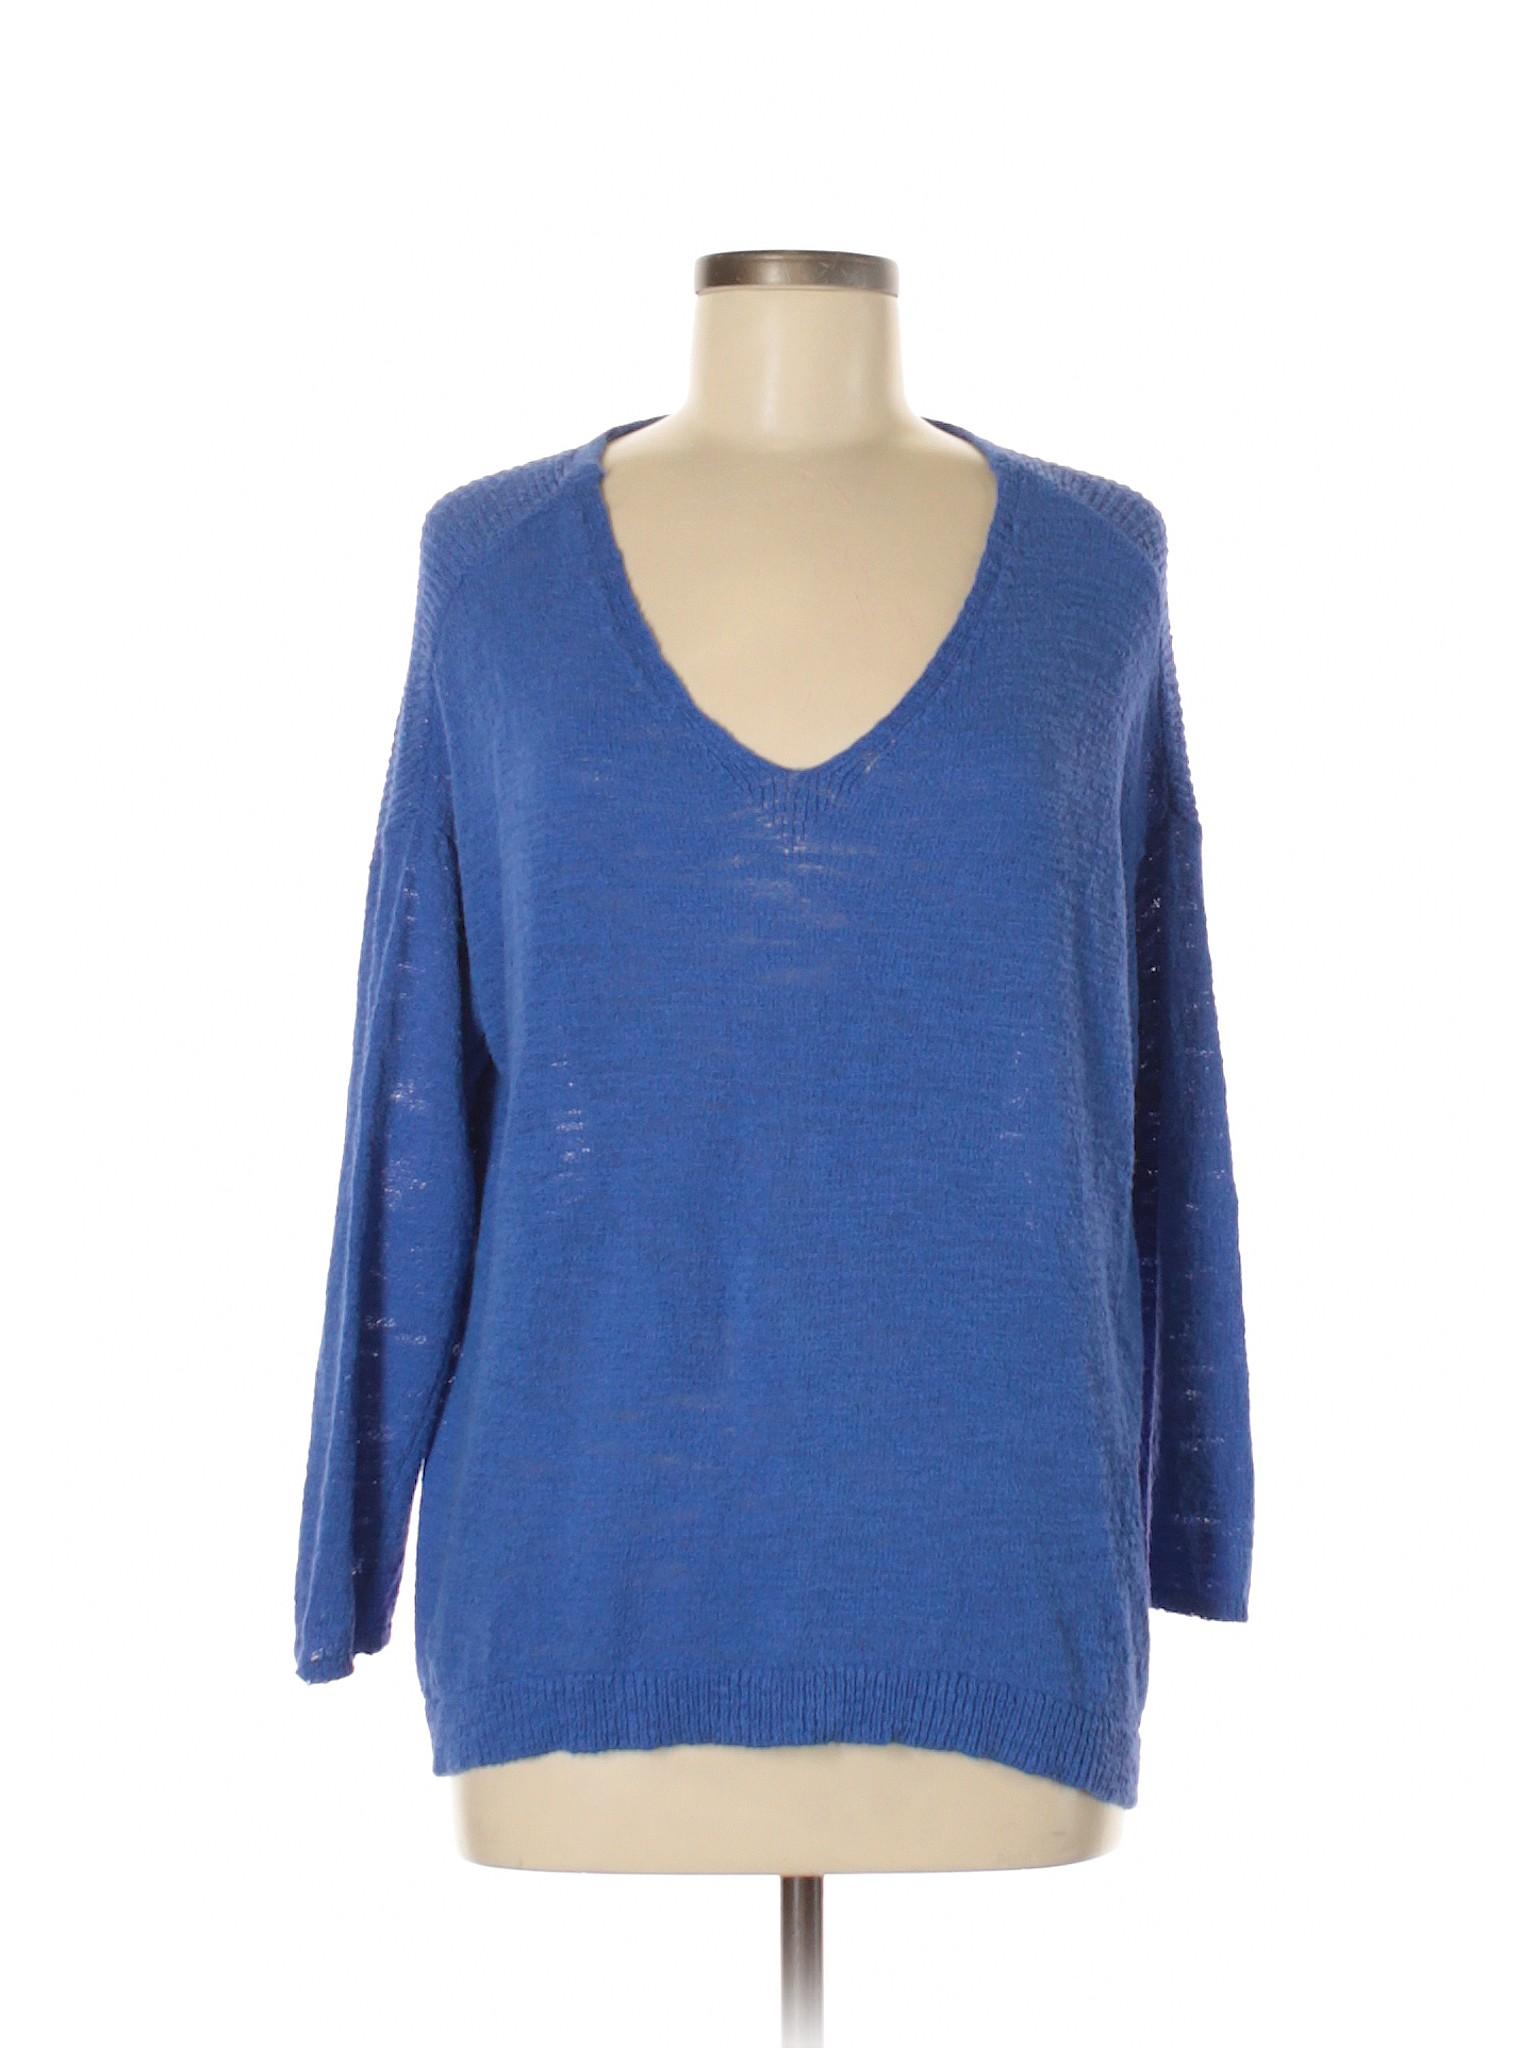 Ann winter LOFT Taylor Boutique Sweater Pullover 8xA41w5q